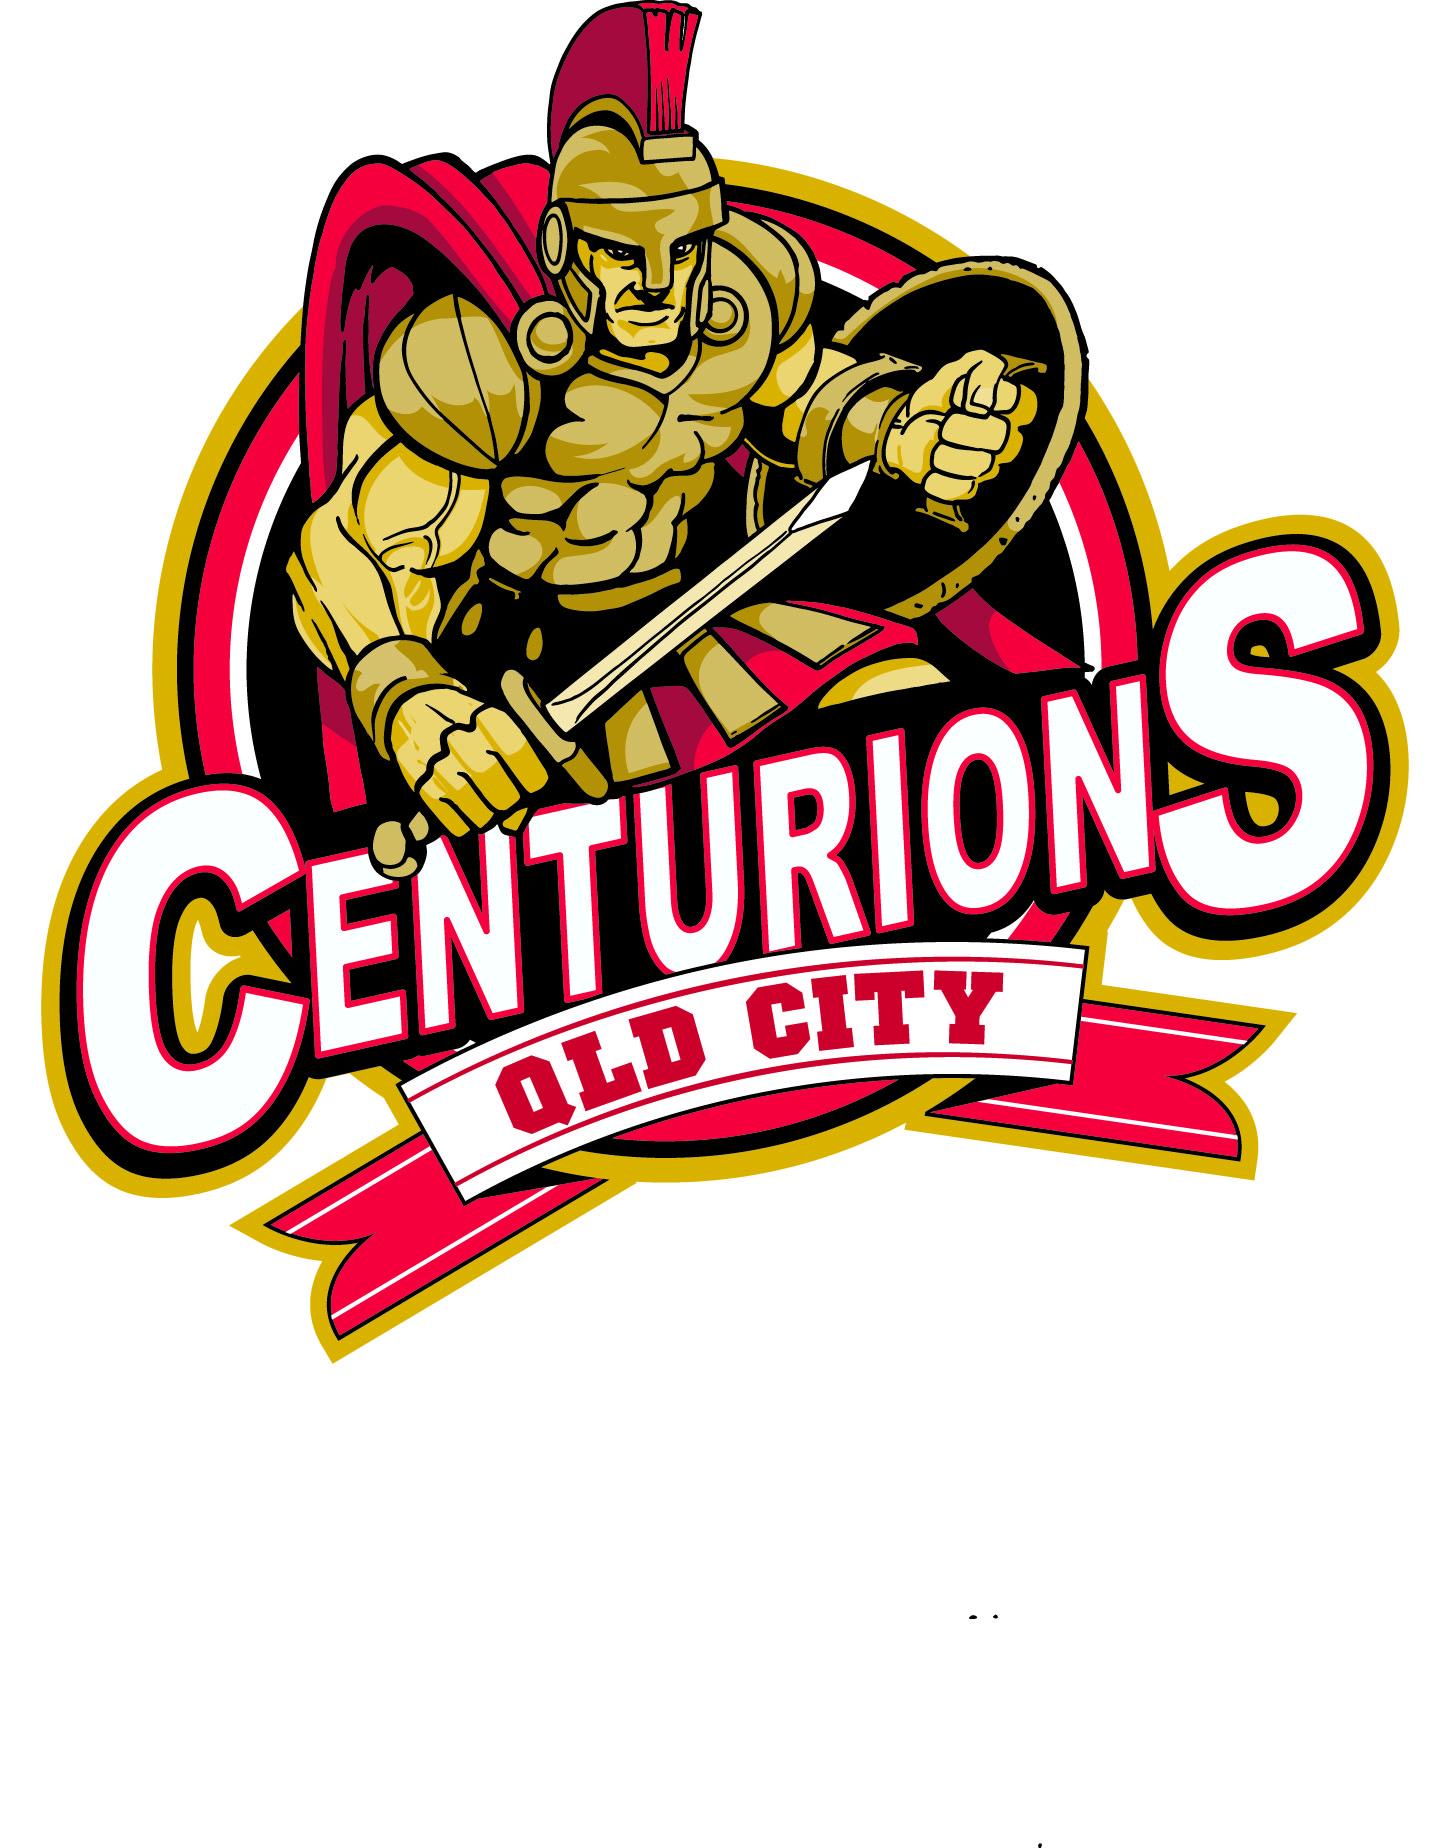 2000000401_centurions02